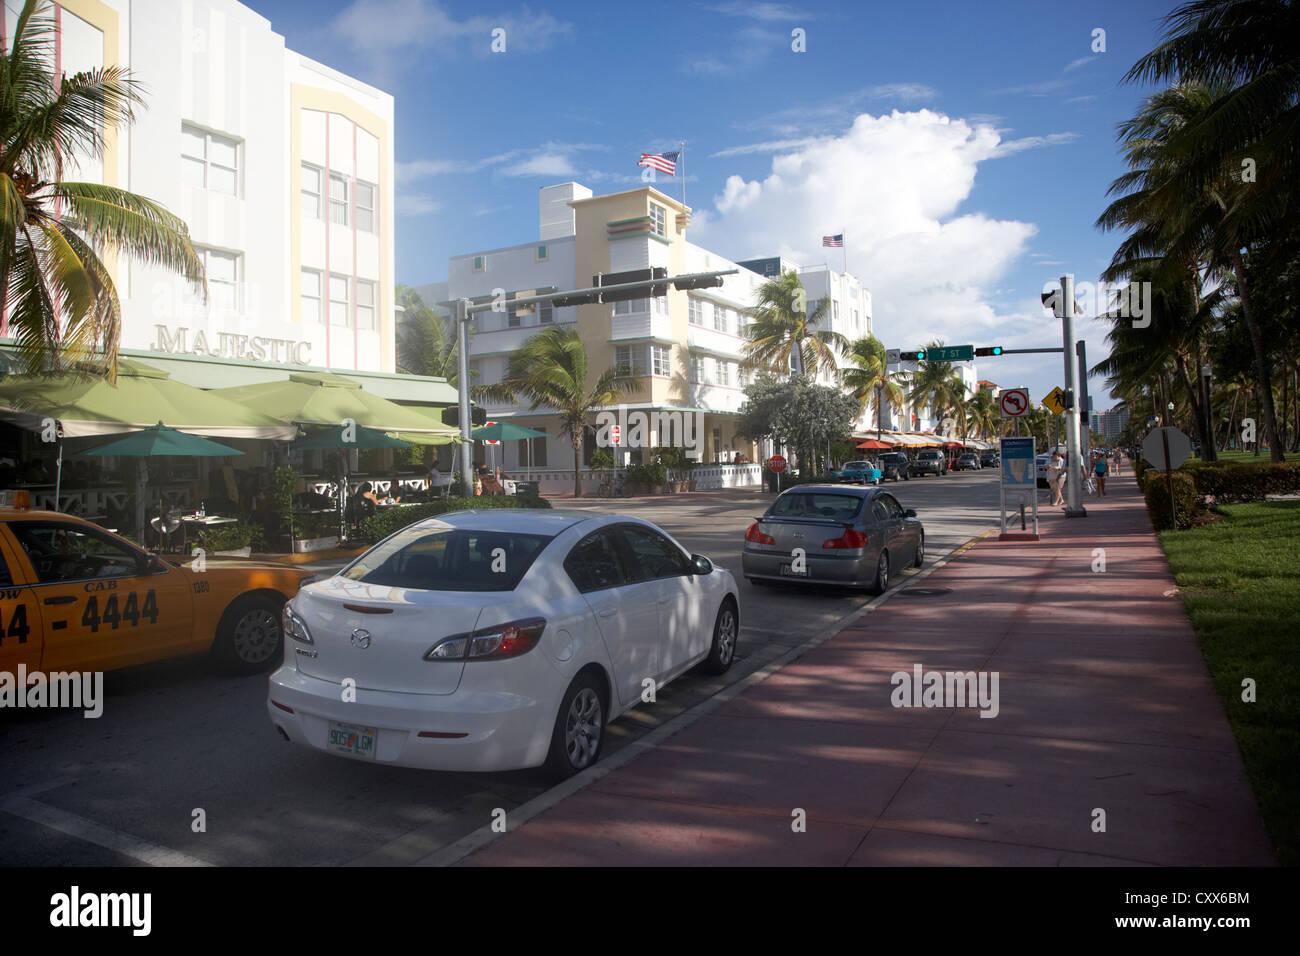 ocean drive early morning art deco district miami south beach florida usa - Stock Image